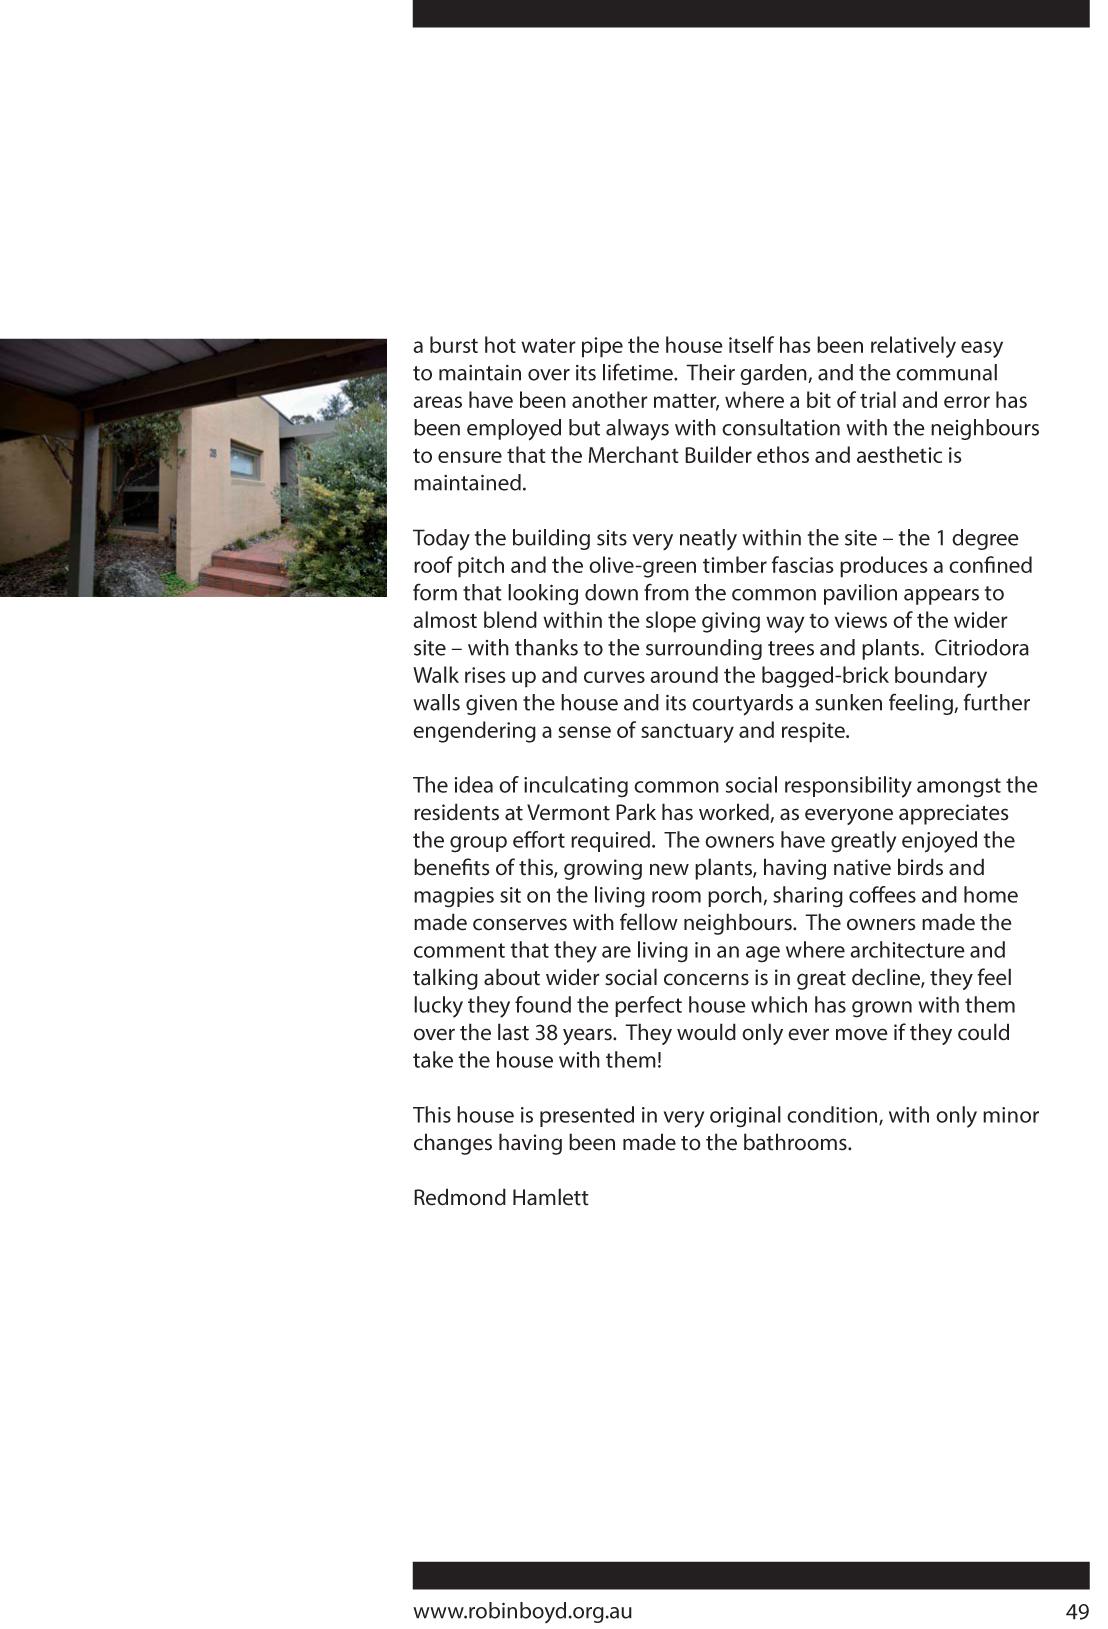 Merchant Builders Rectangle House Review 24SEP17-4.jpg